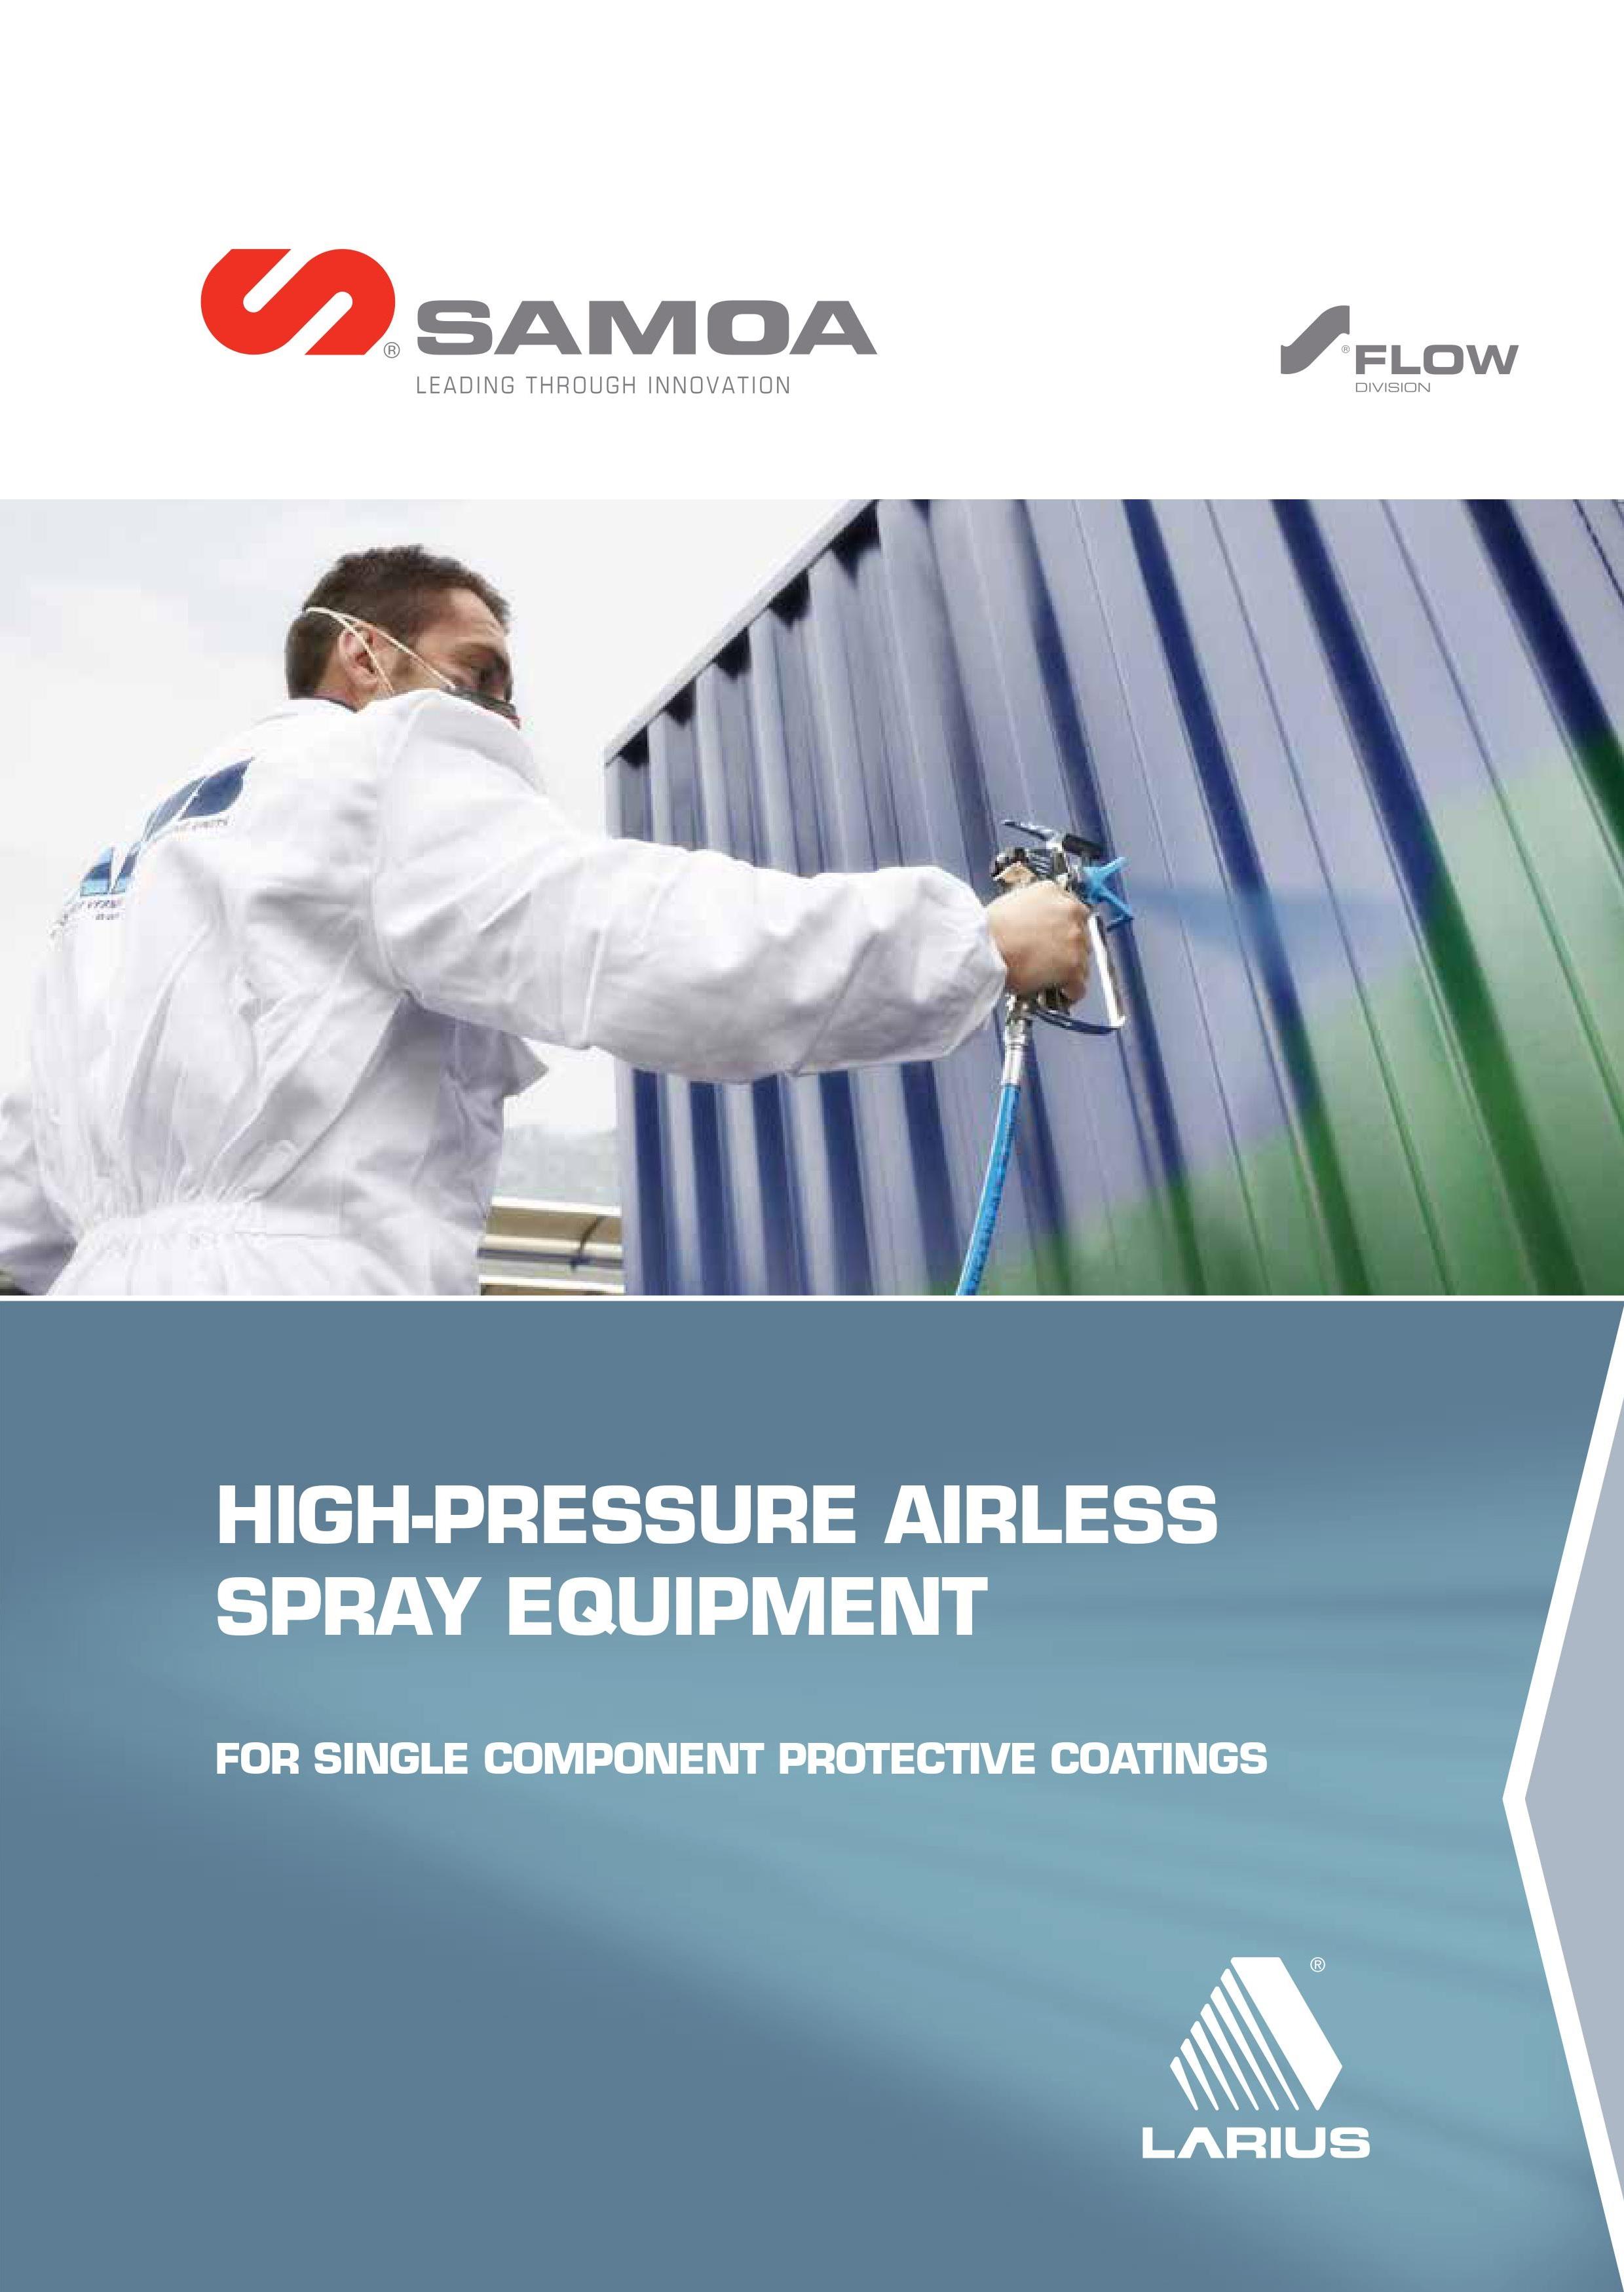 SAMOA Larius Airless Paint Sprayers Brochure